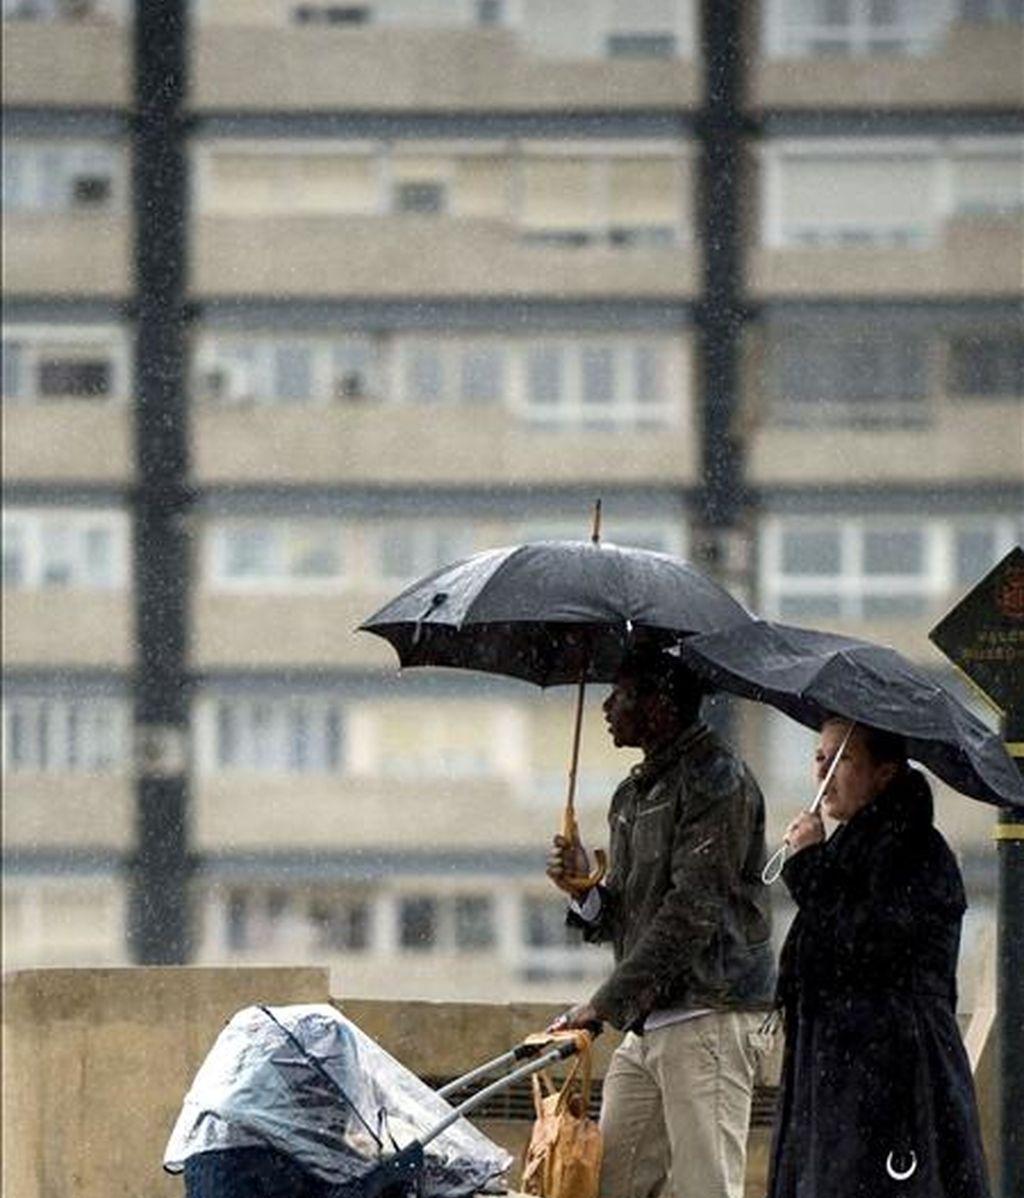 Una familia se protege con un paraguas de la lluvia. EFE/Archivo